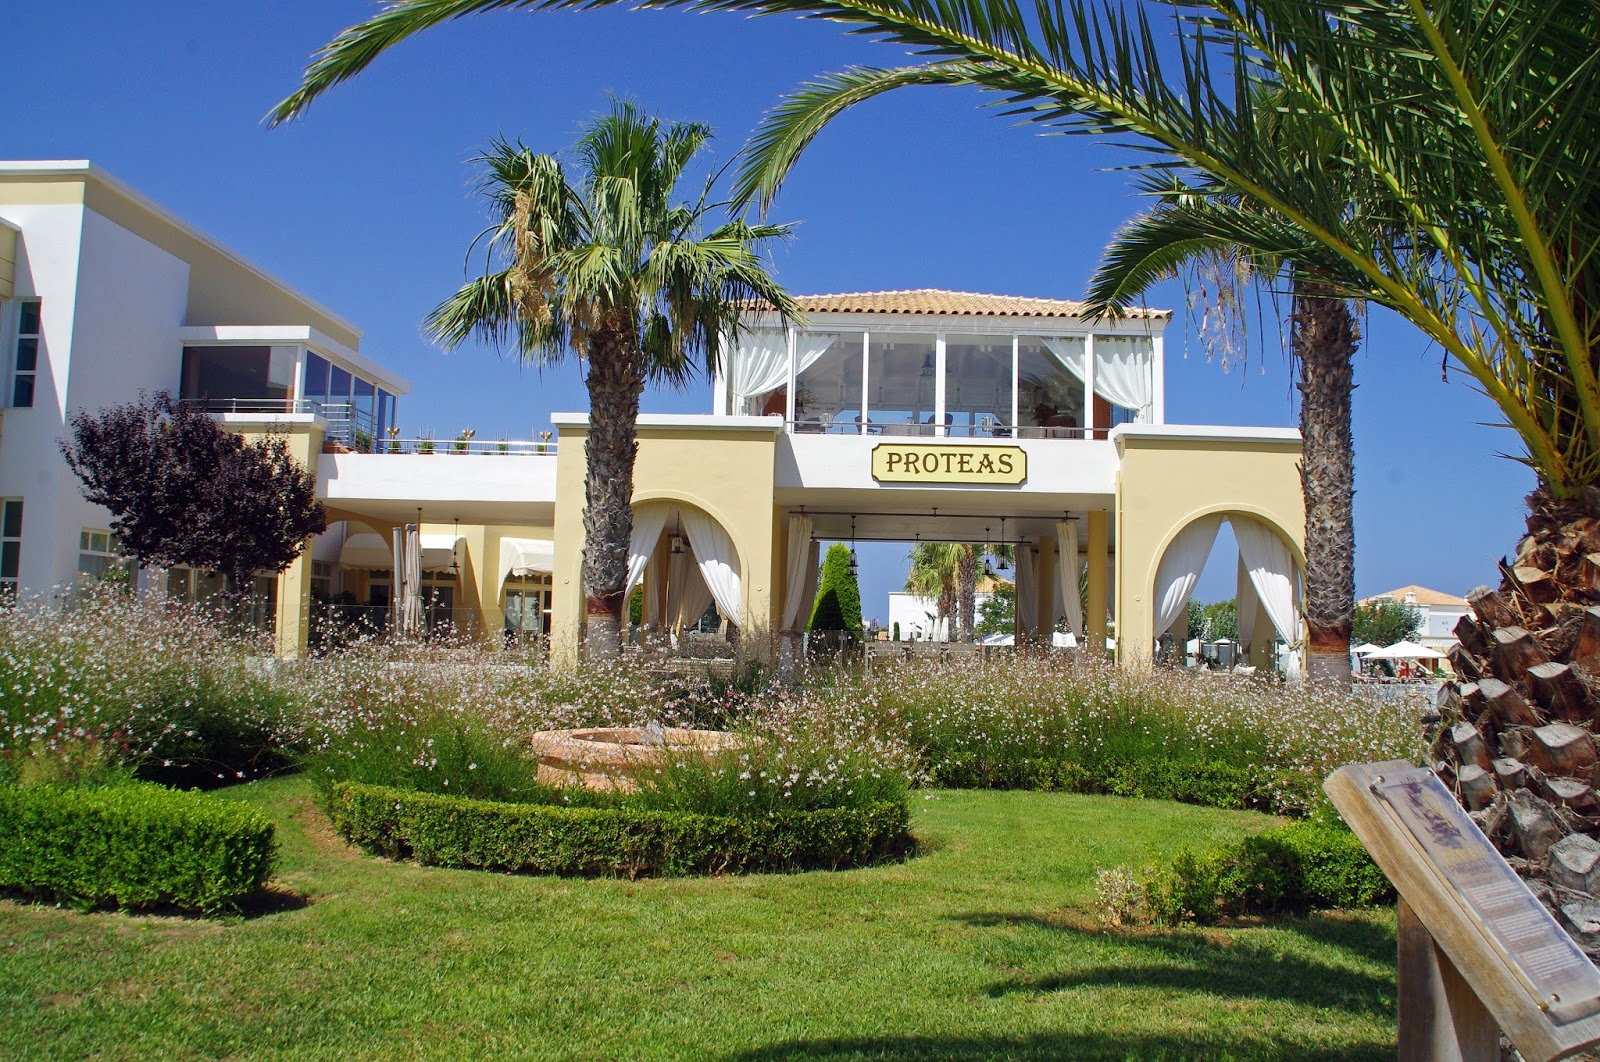 Neptune Hotel Kos Proteas Restaurant